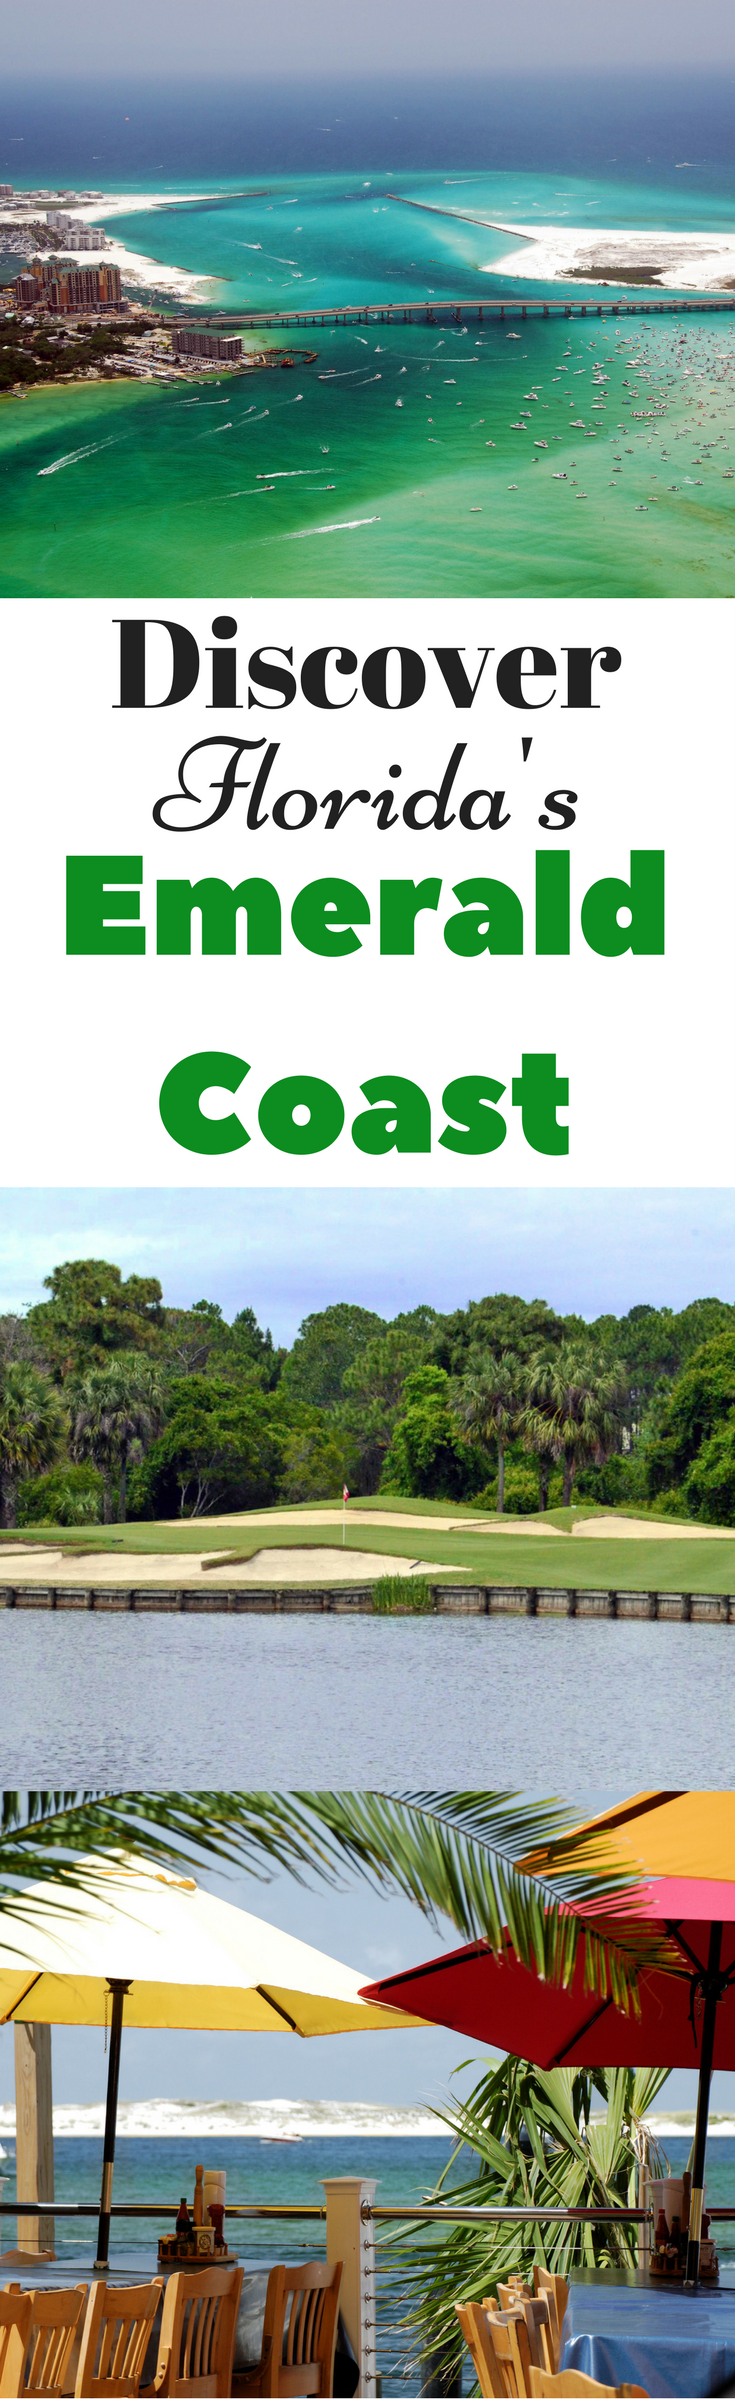 Florida's Emerald Coast, Florida's Emerald Coast, Emerald Coast Travel, Emerald Coast Events, Destin